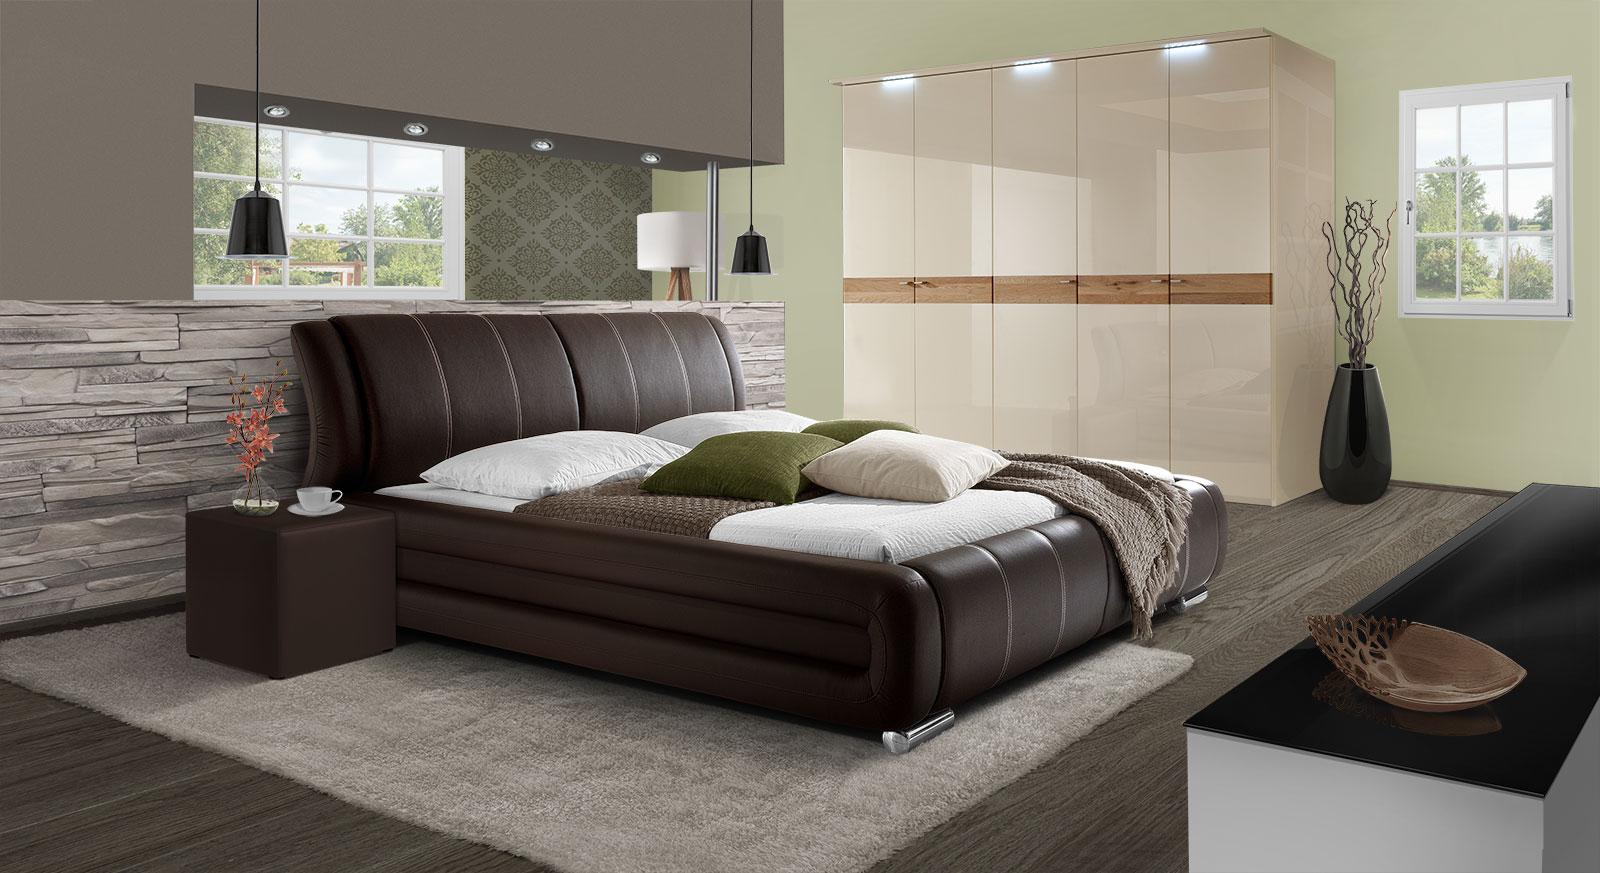 kunstlederbett in braun schwarz oder wei petersfield